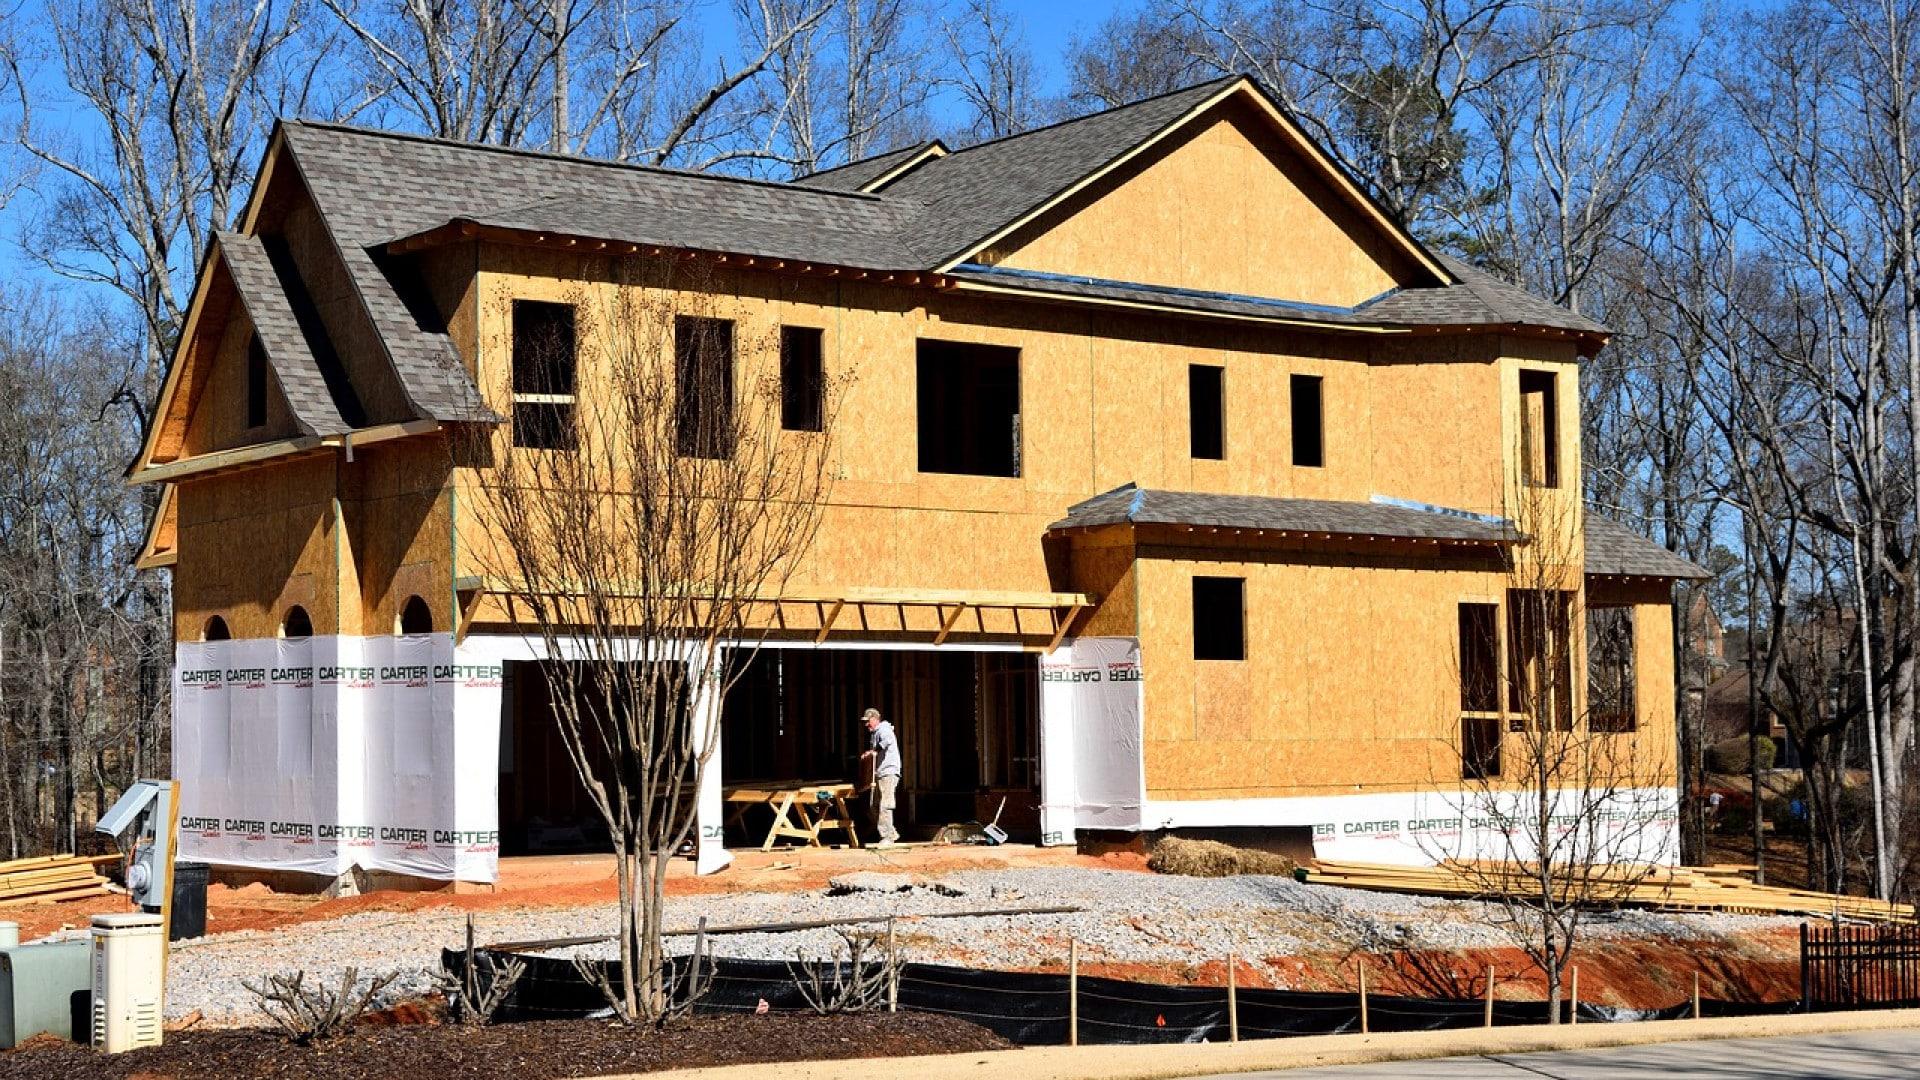 investir dans l'immobilier rennes